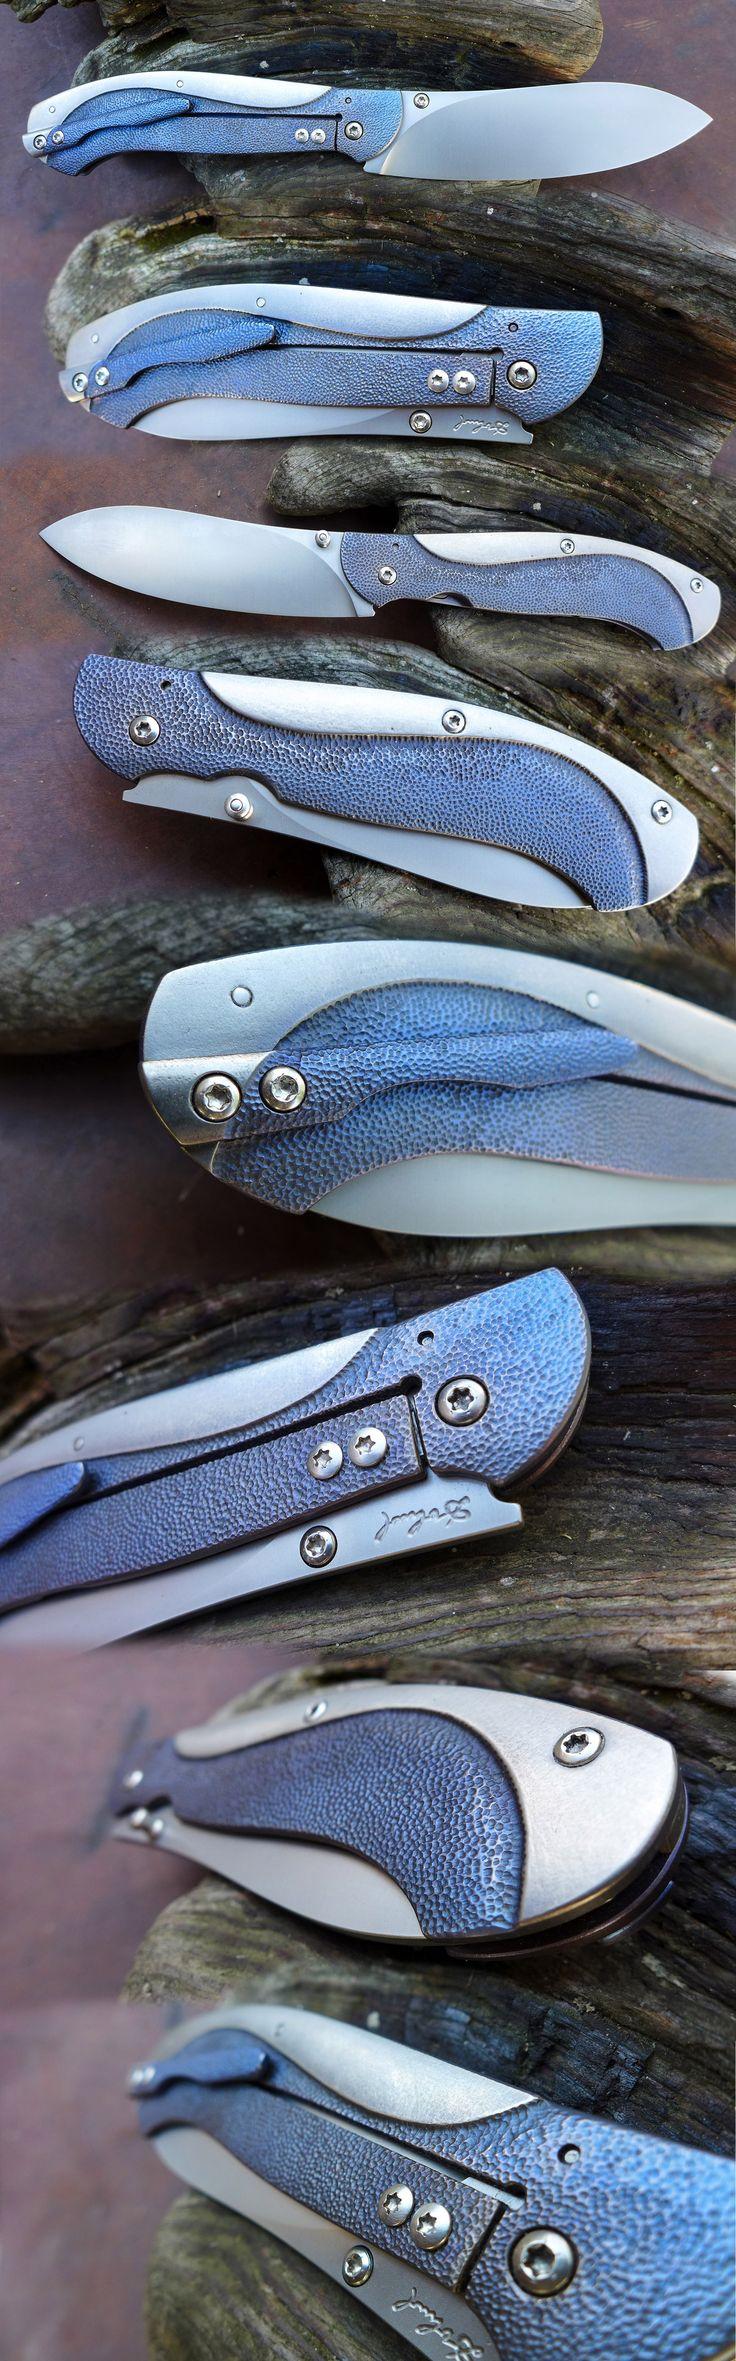 Framelock. Elmax blade, blue titanium.